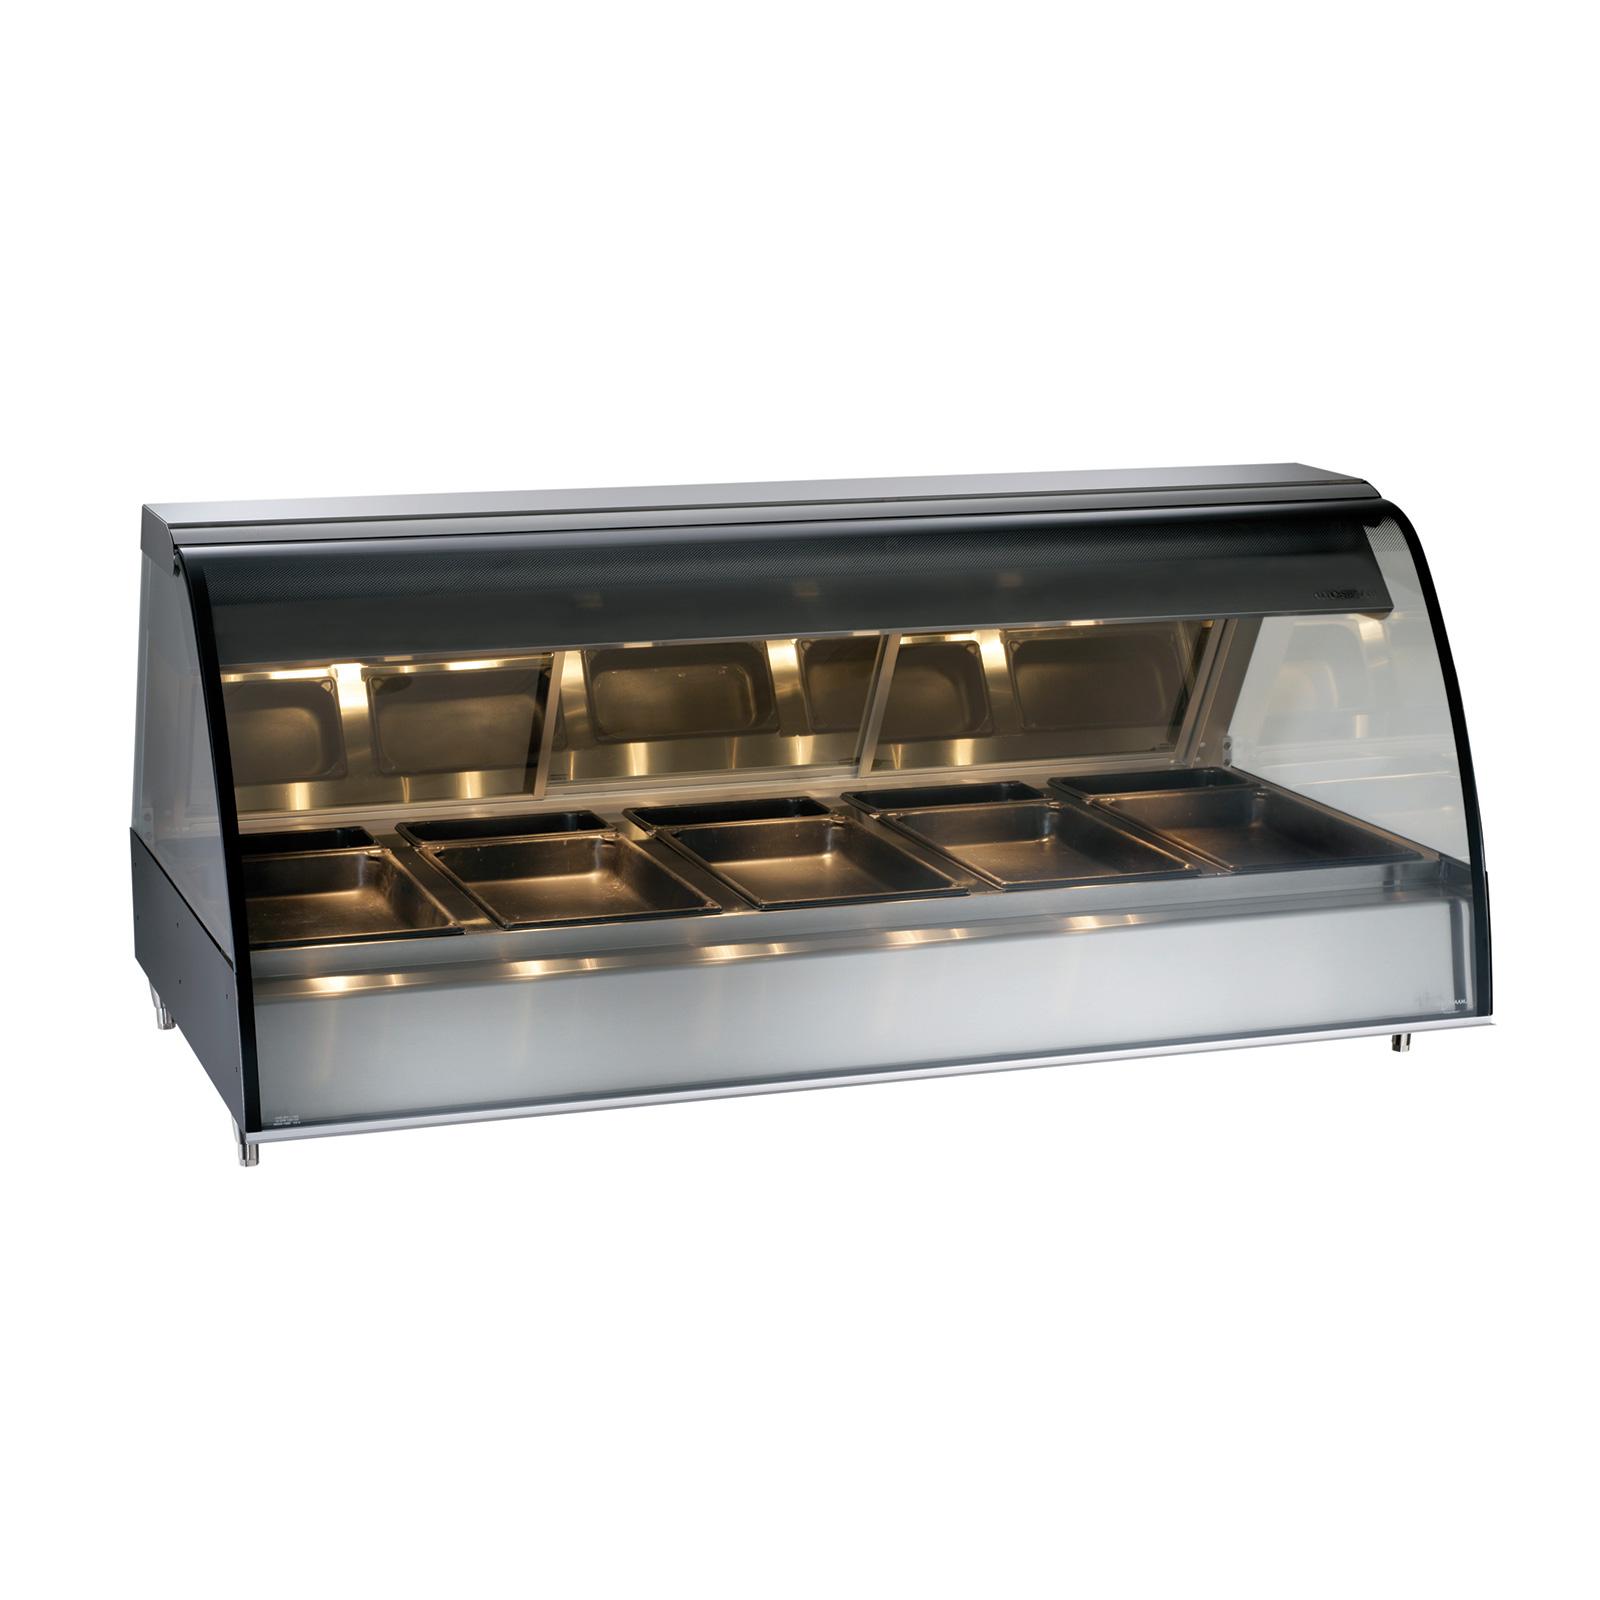 Alto-Shaam TY2-72-SS display case, heated deli, countertop